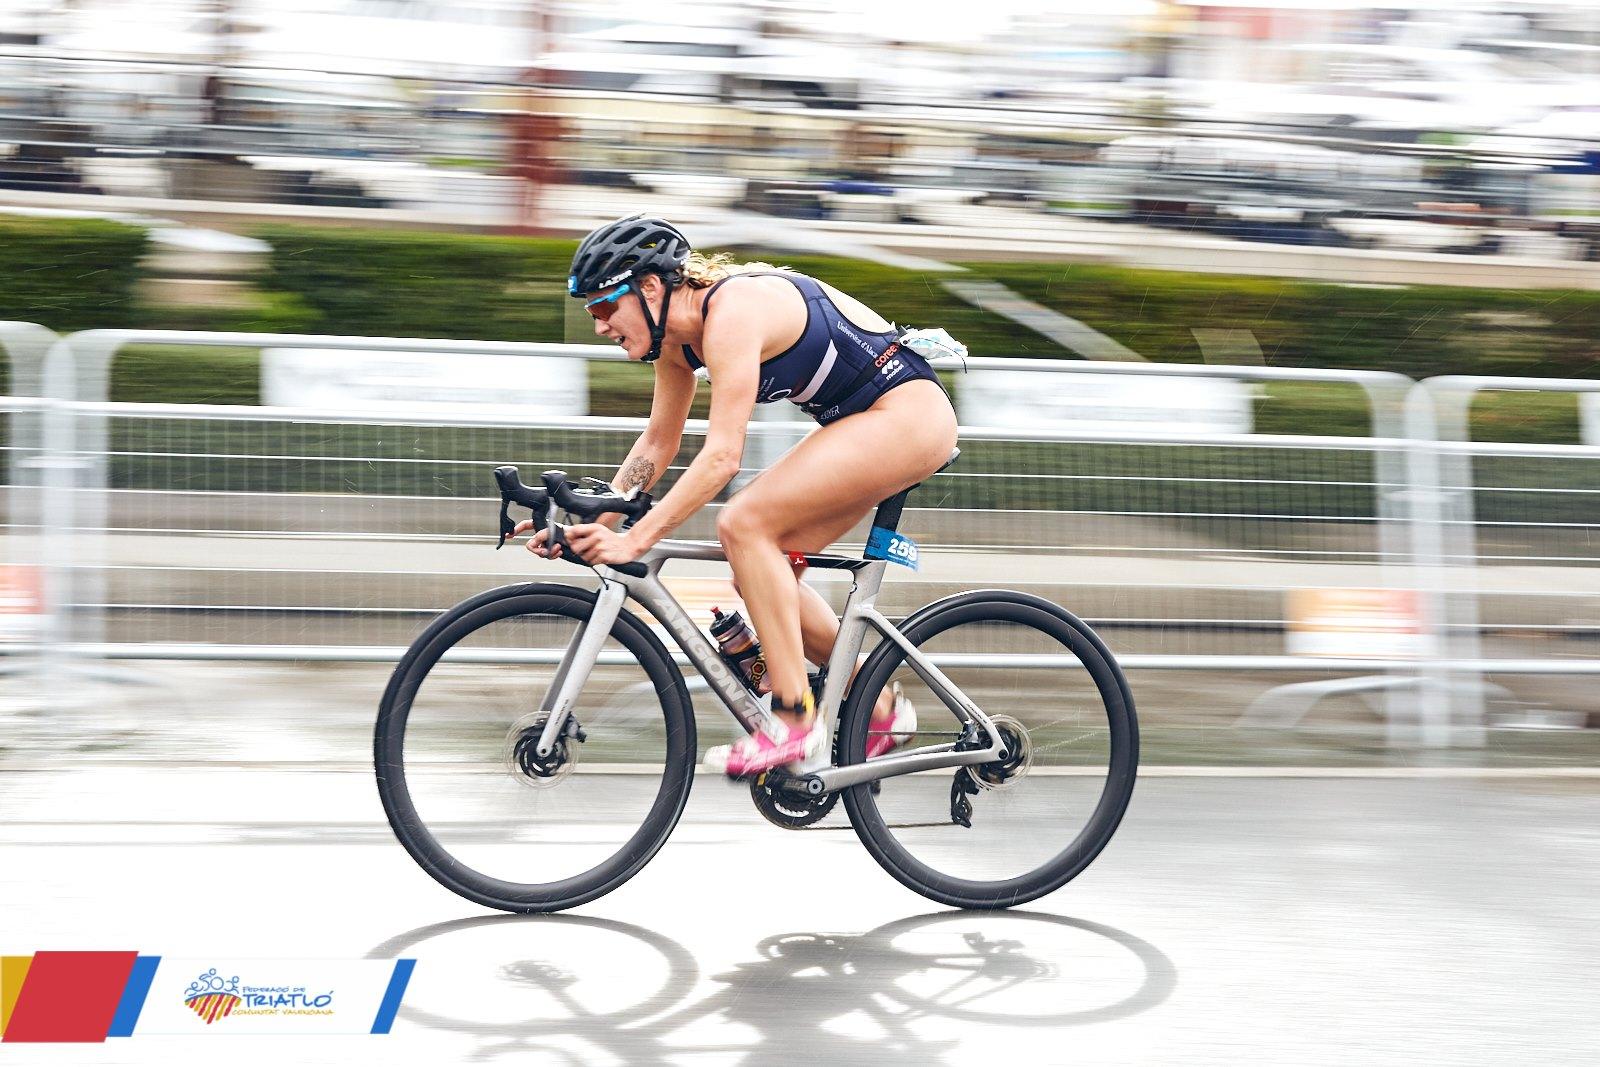 La Federació de Triatló de la Comunitat Valenciana avanza el calendario de competiciones de 2021